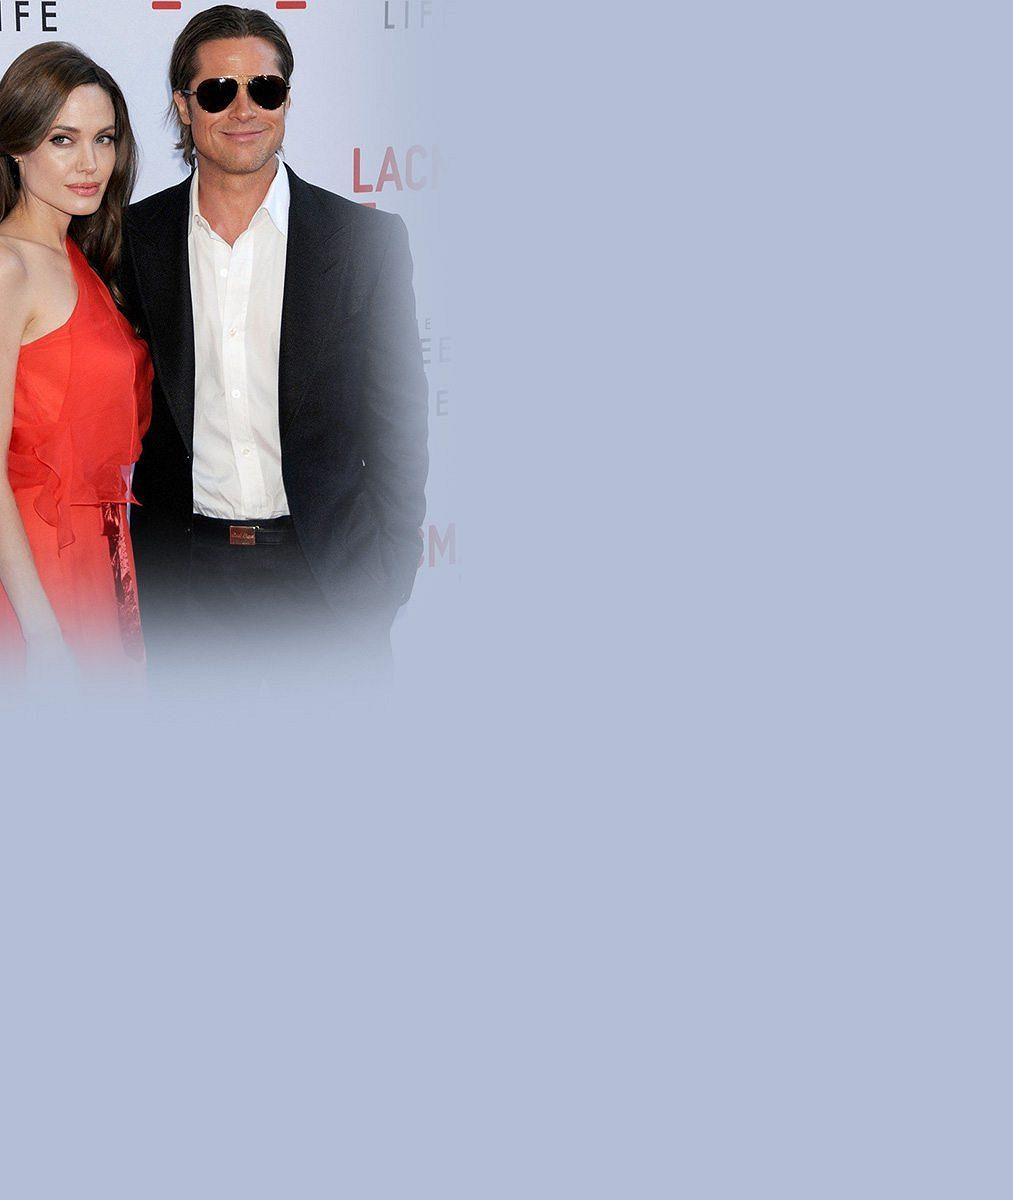 Svitla jim naděje? Rozvod Angeliny Jolie a Brada Pitta se prý odkládá